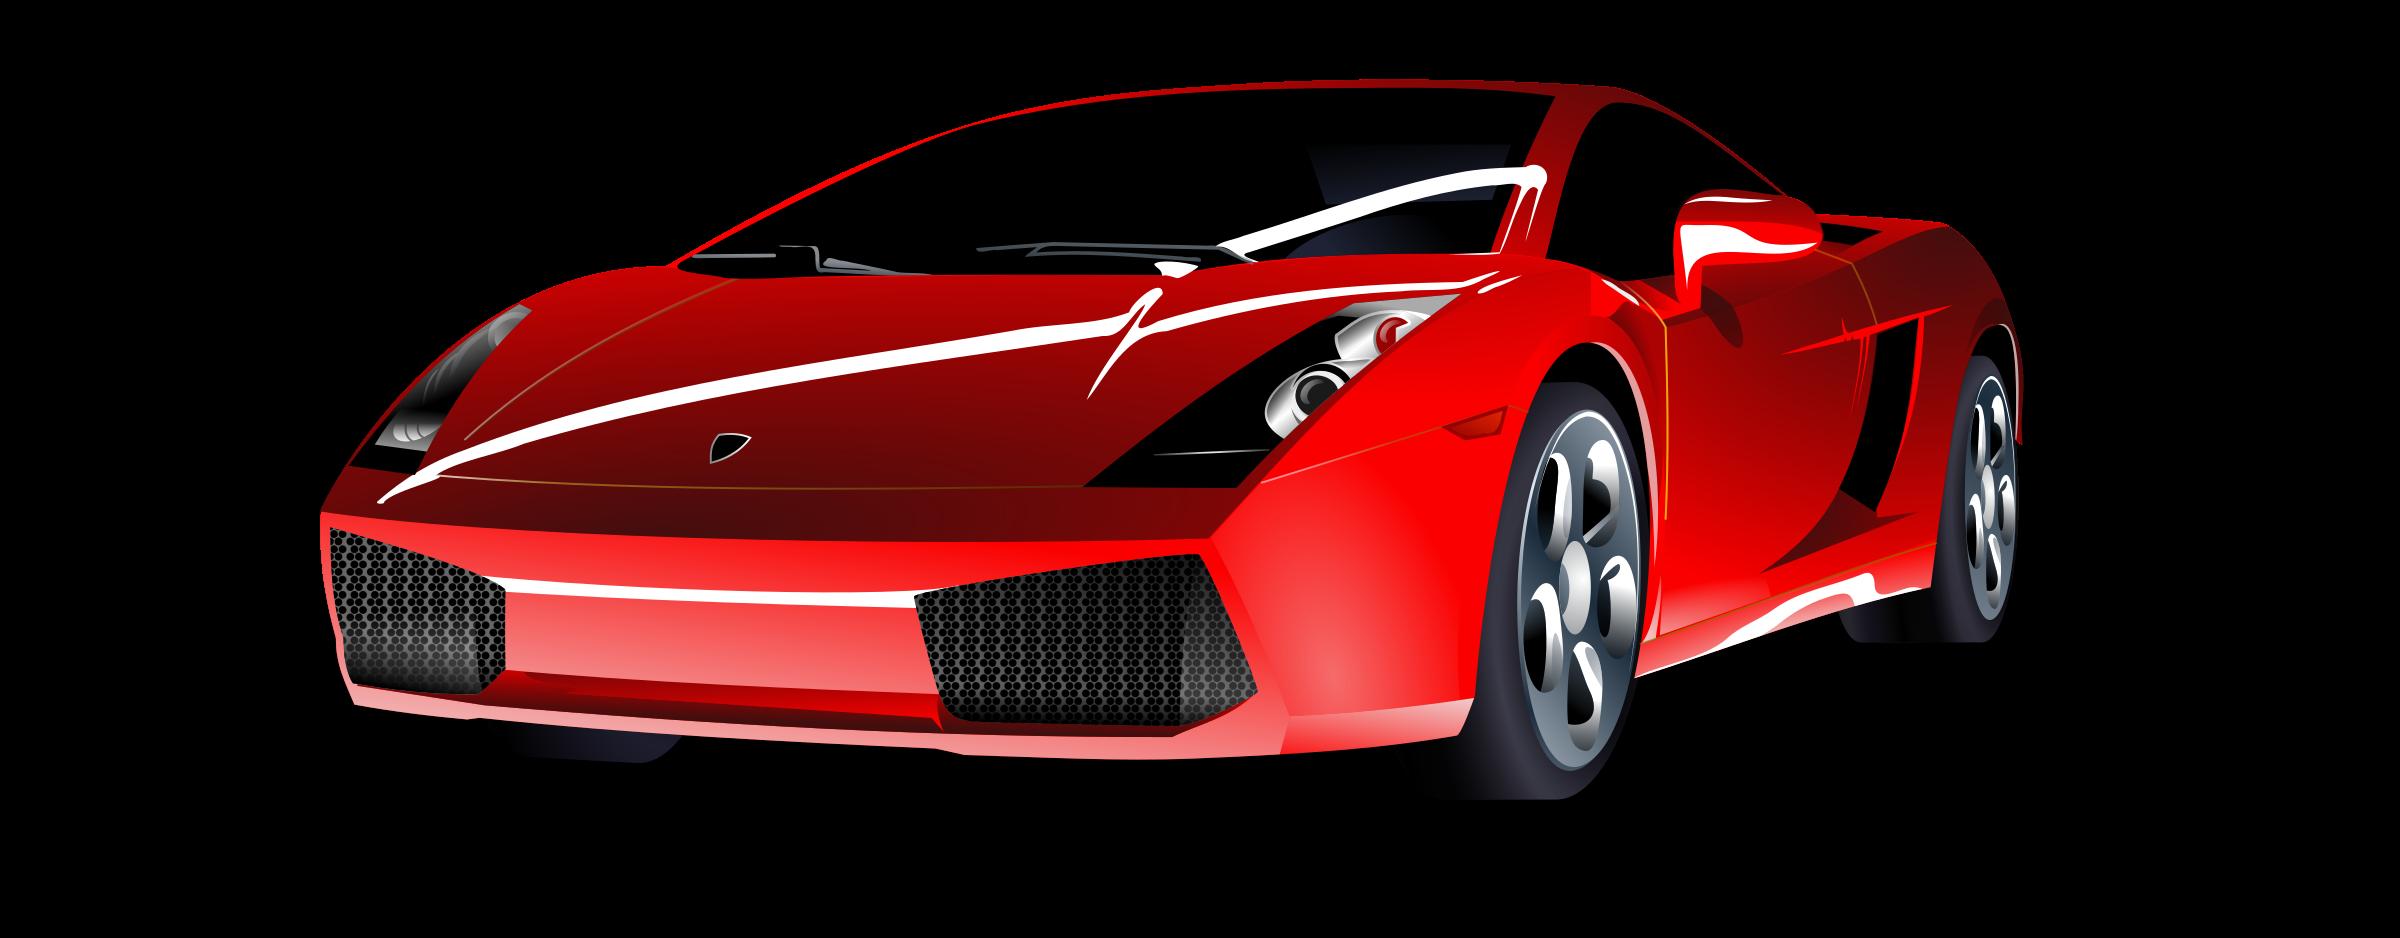 Red sports car big. Clipart cars colour